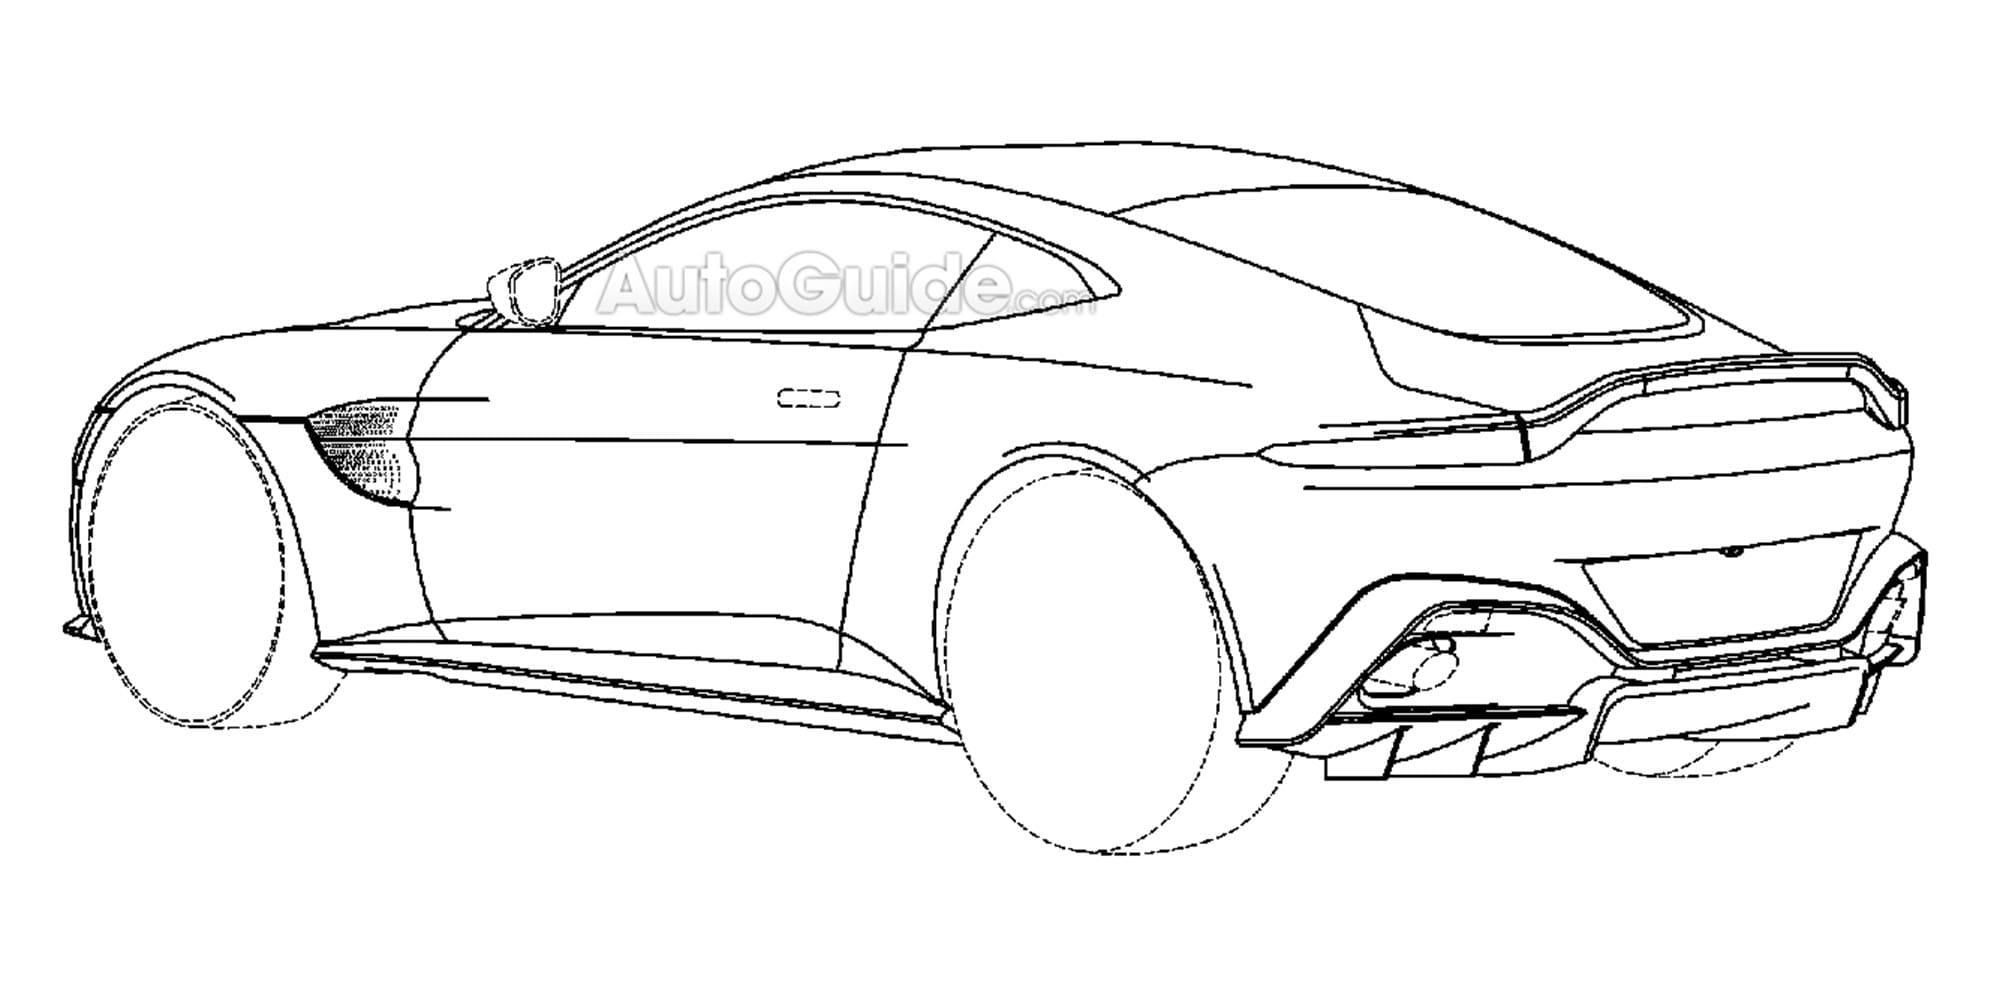 2018 Aston Martin Vantage Patent Diagrams Discovered